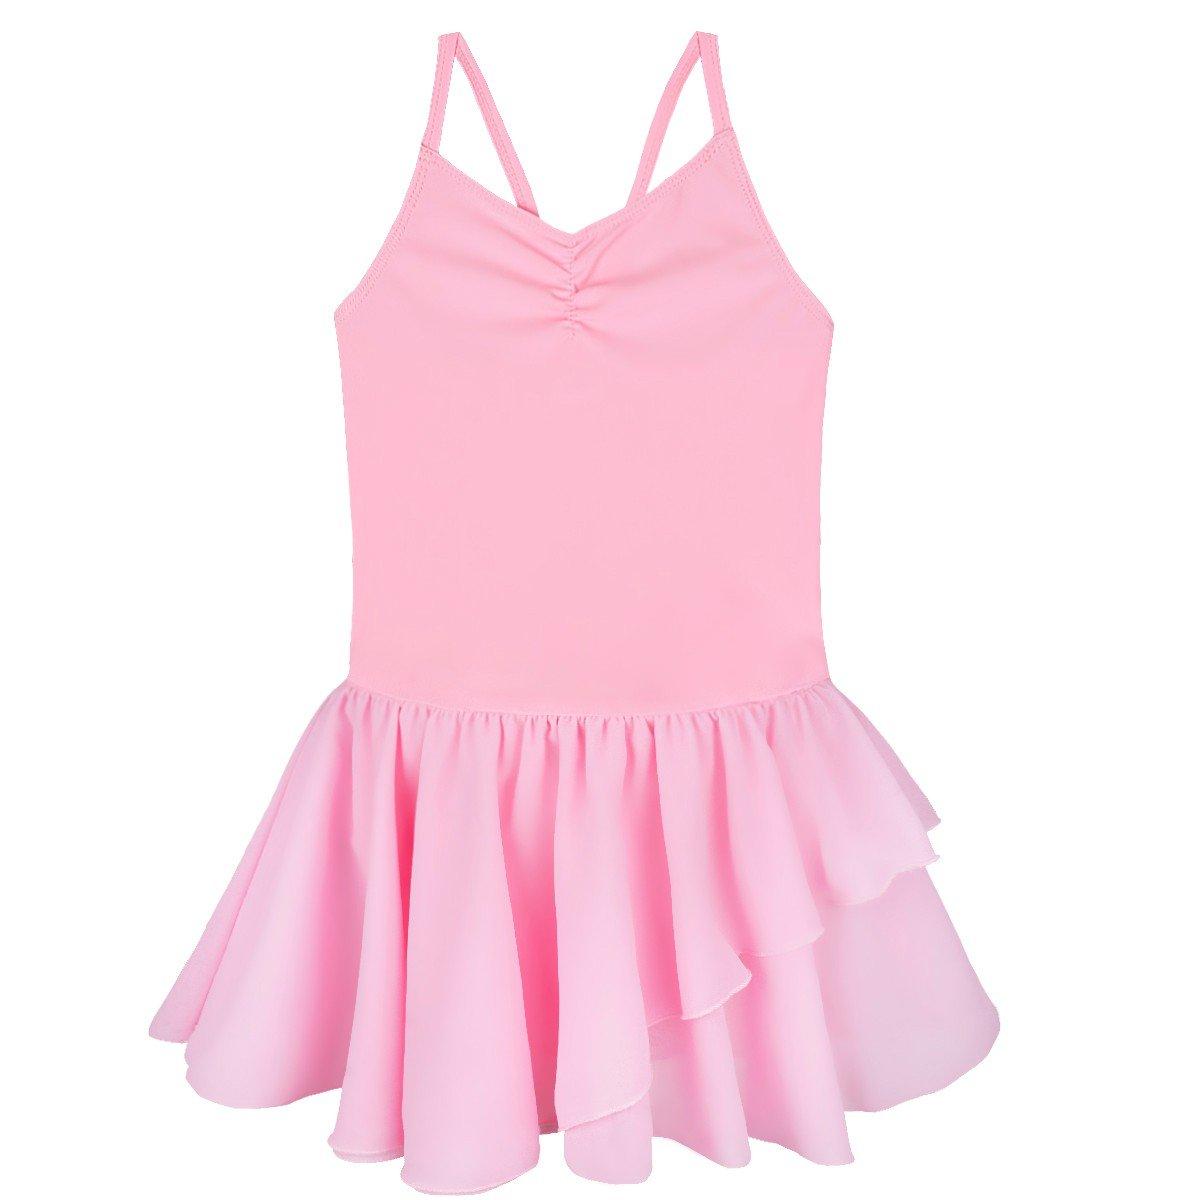 FEESHOW SOCKSHOSIERY ガールズ B01M3YJW5M 2-3|ピンク ピンク 43499